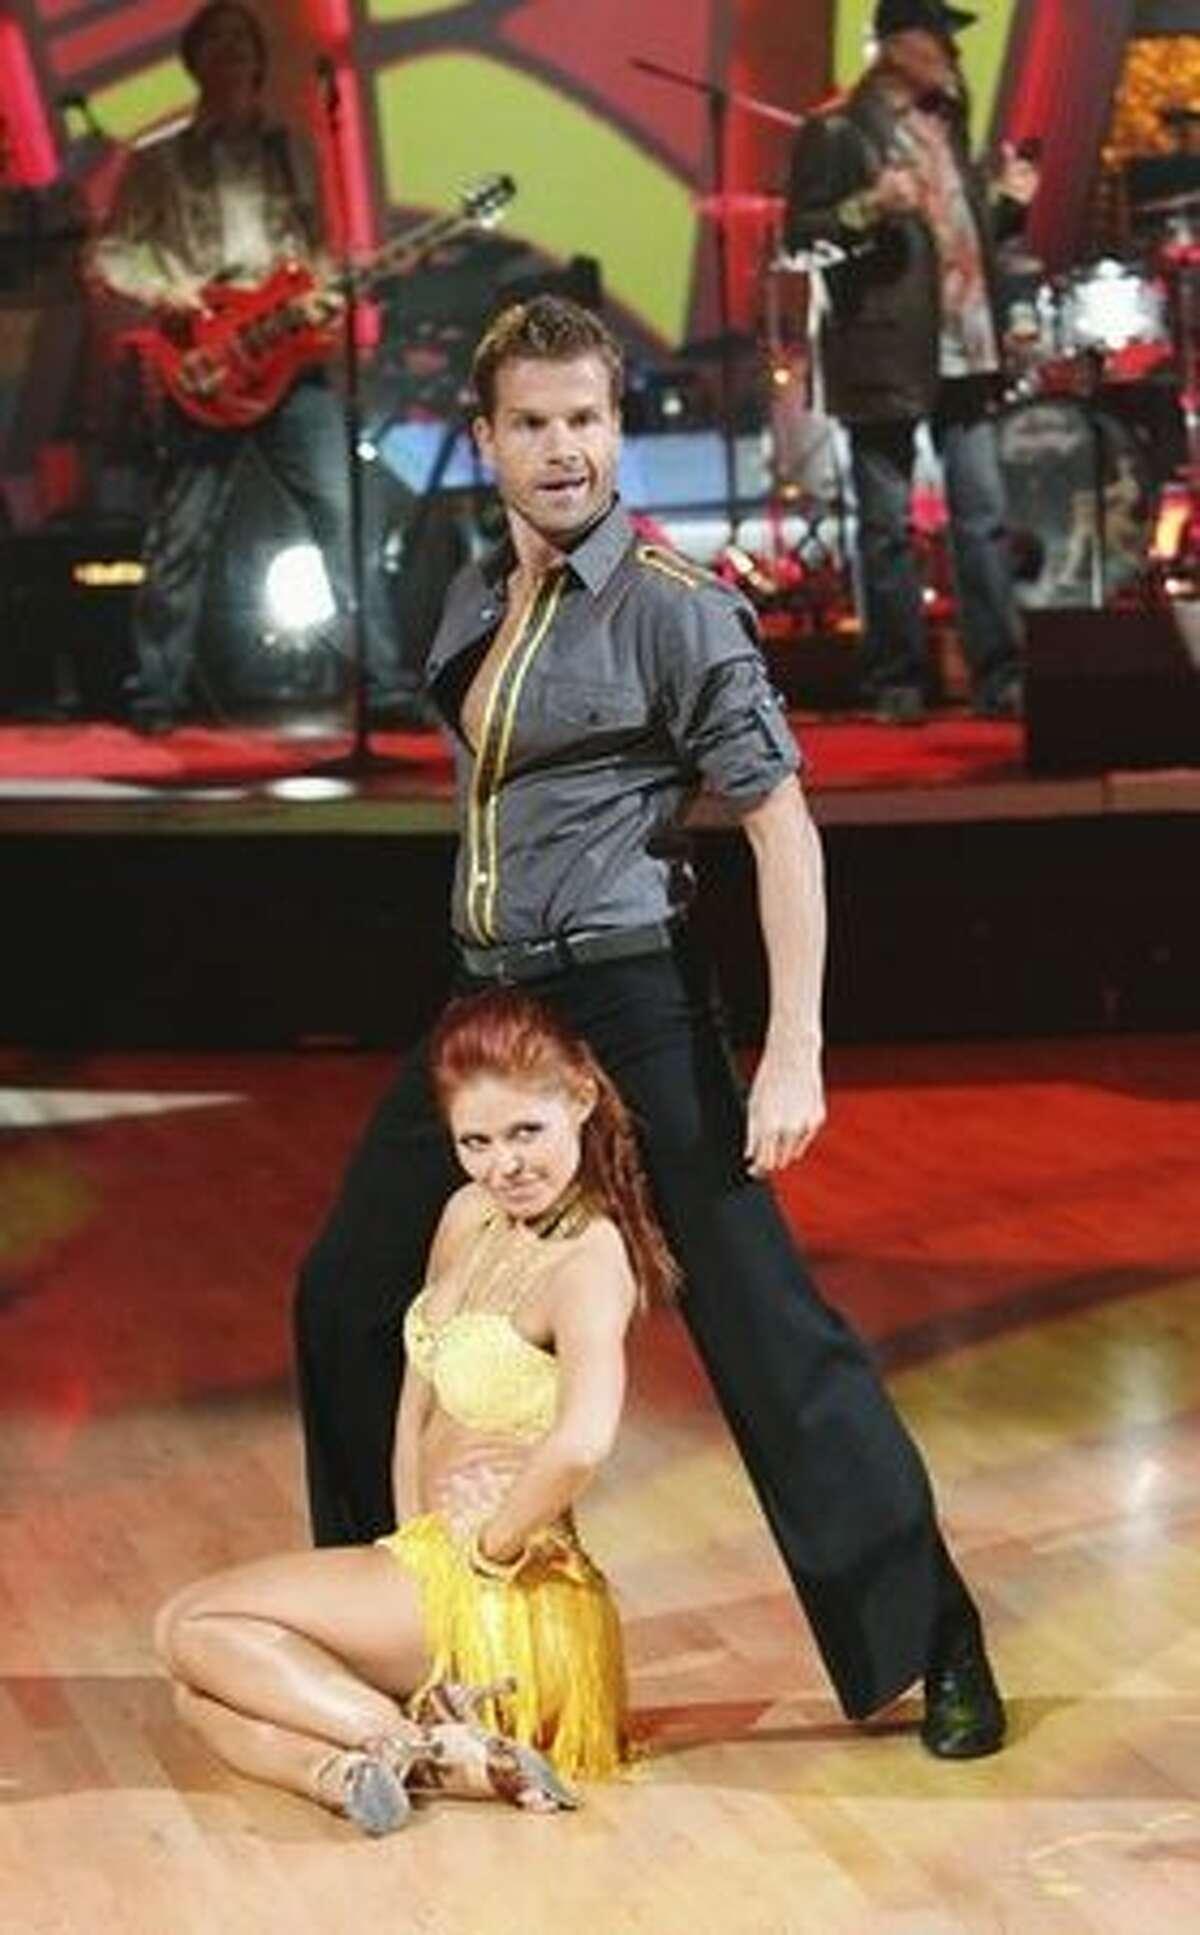 Dancers Louis Van Amstel and Anna Trebunskya perform with the Beach Boys.